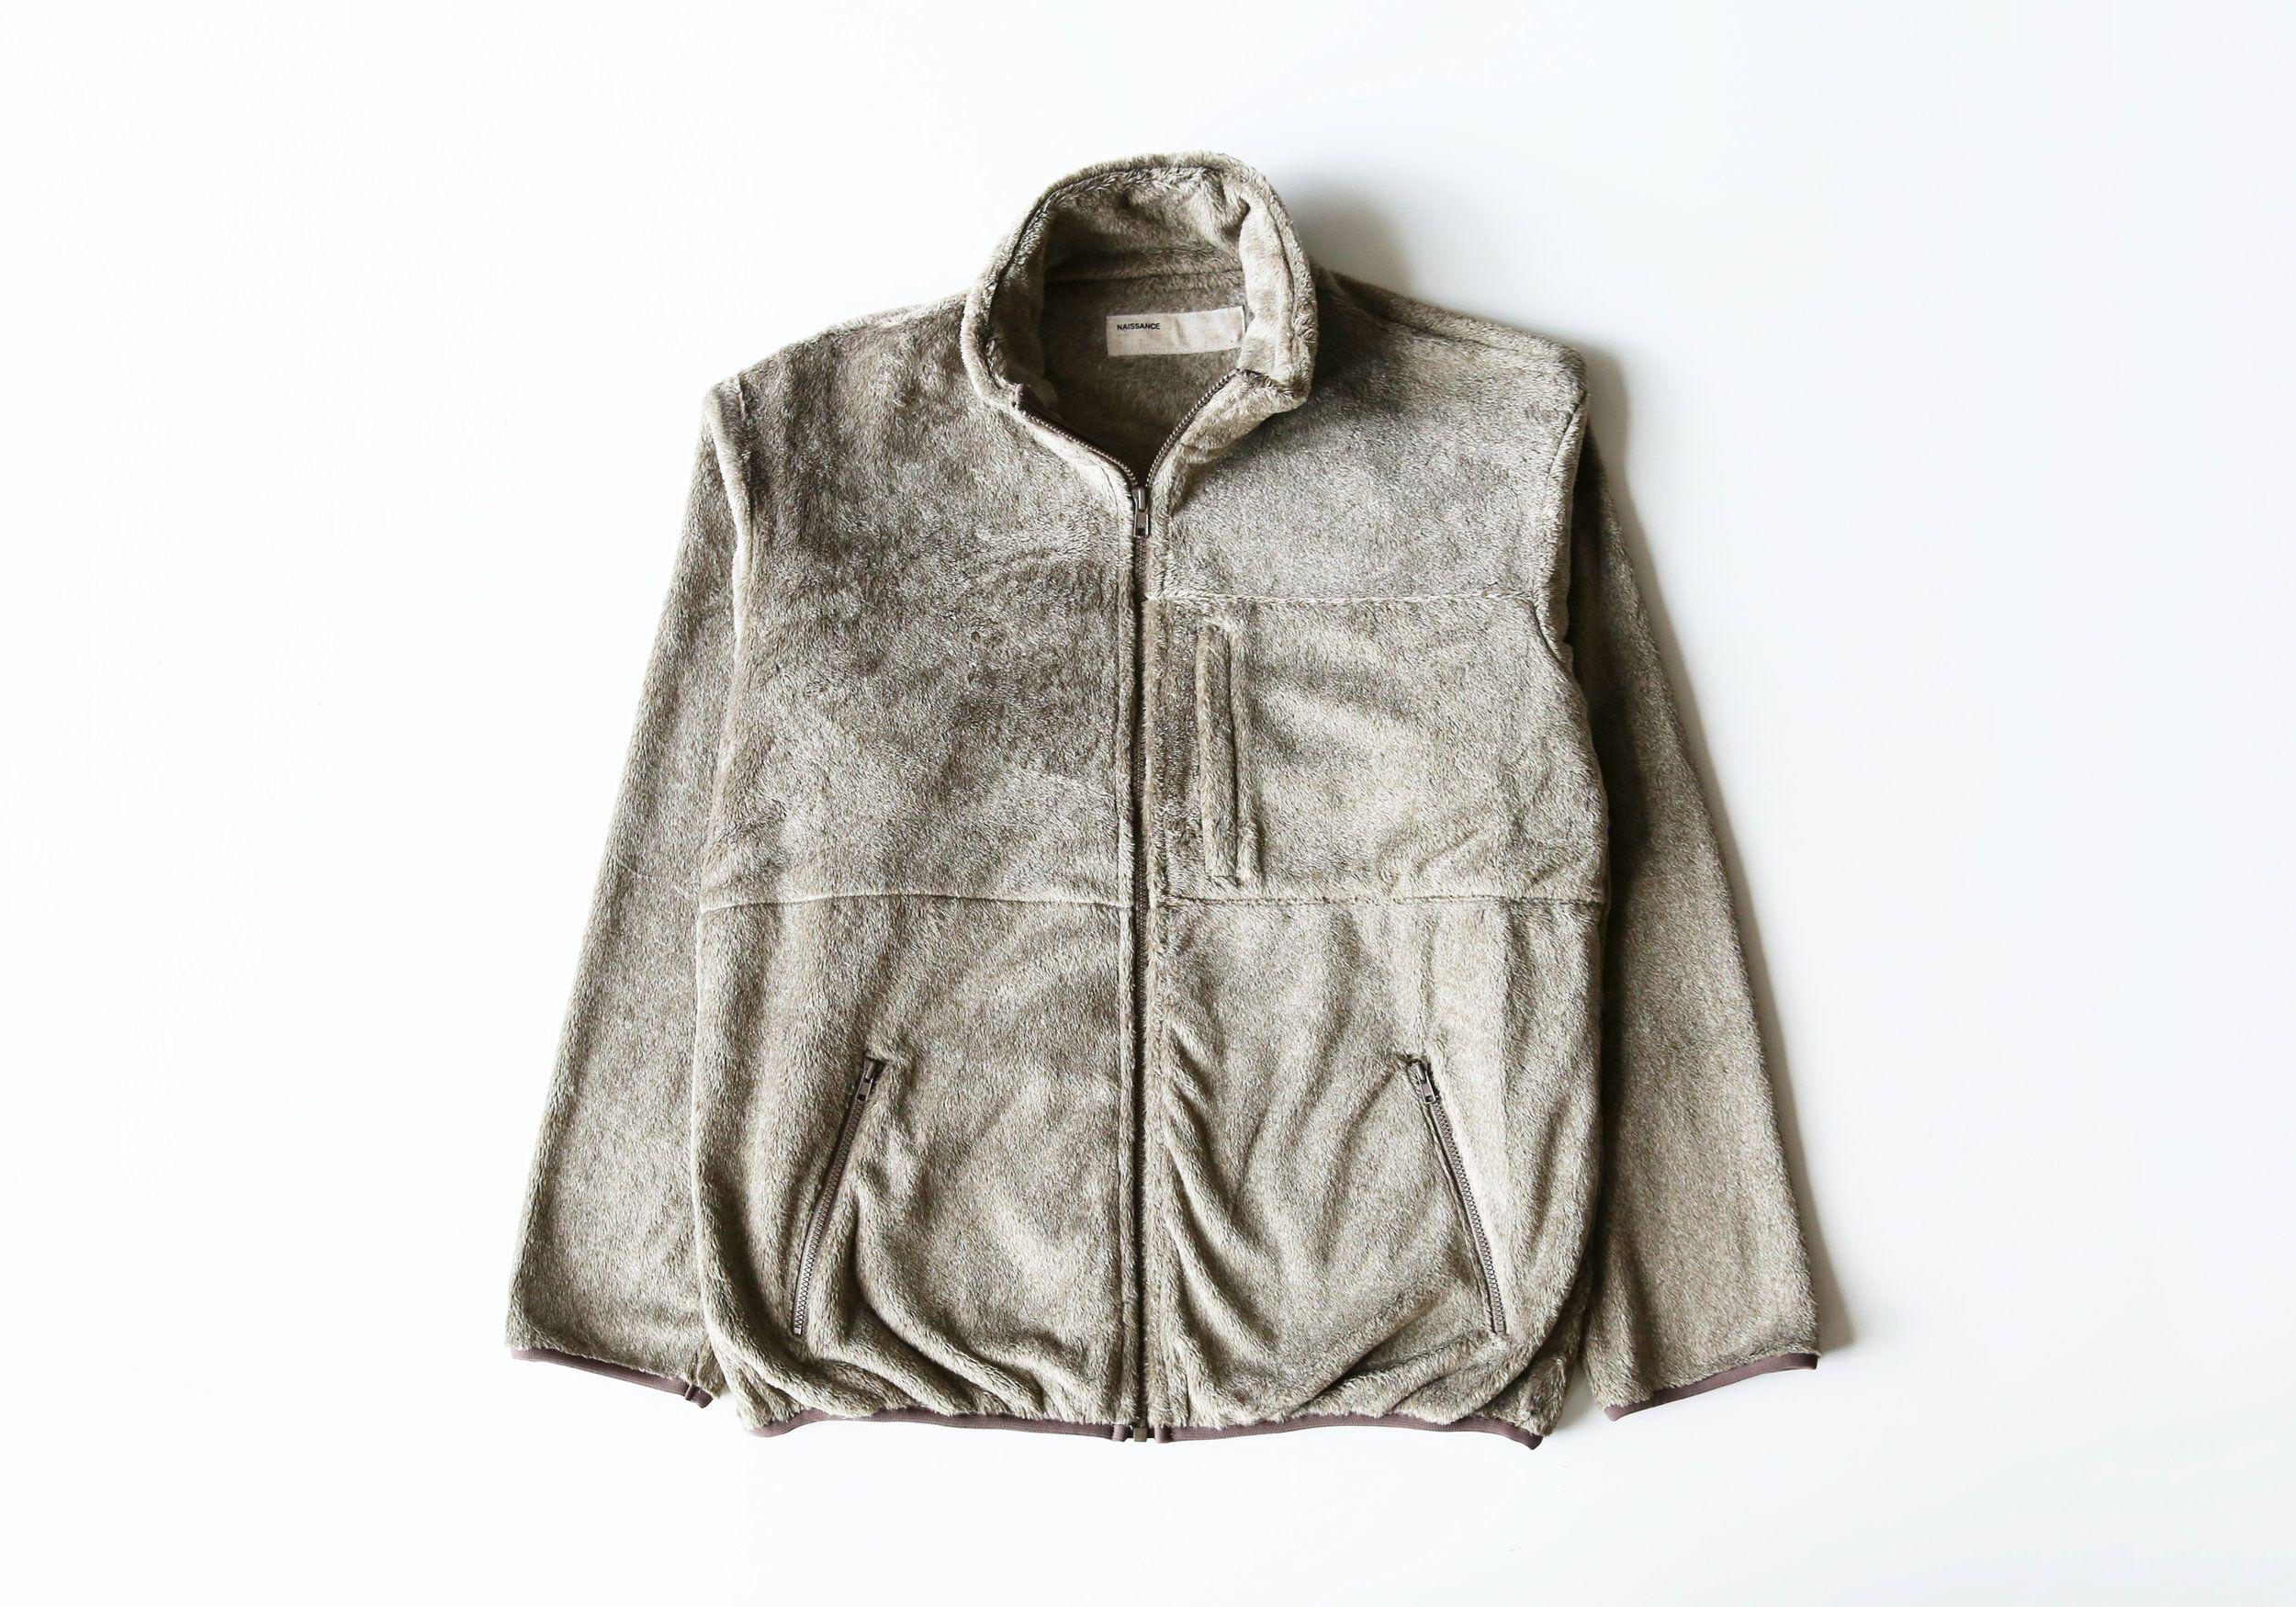 Classic fleece jacket style constructed from a premium fleece